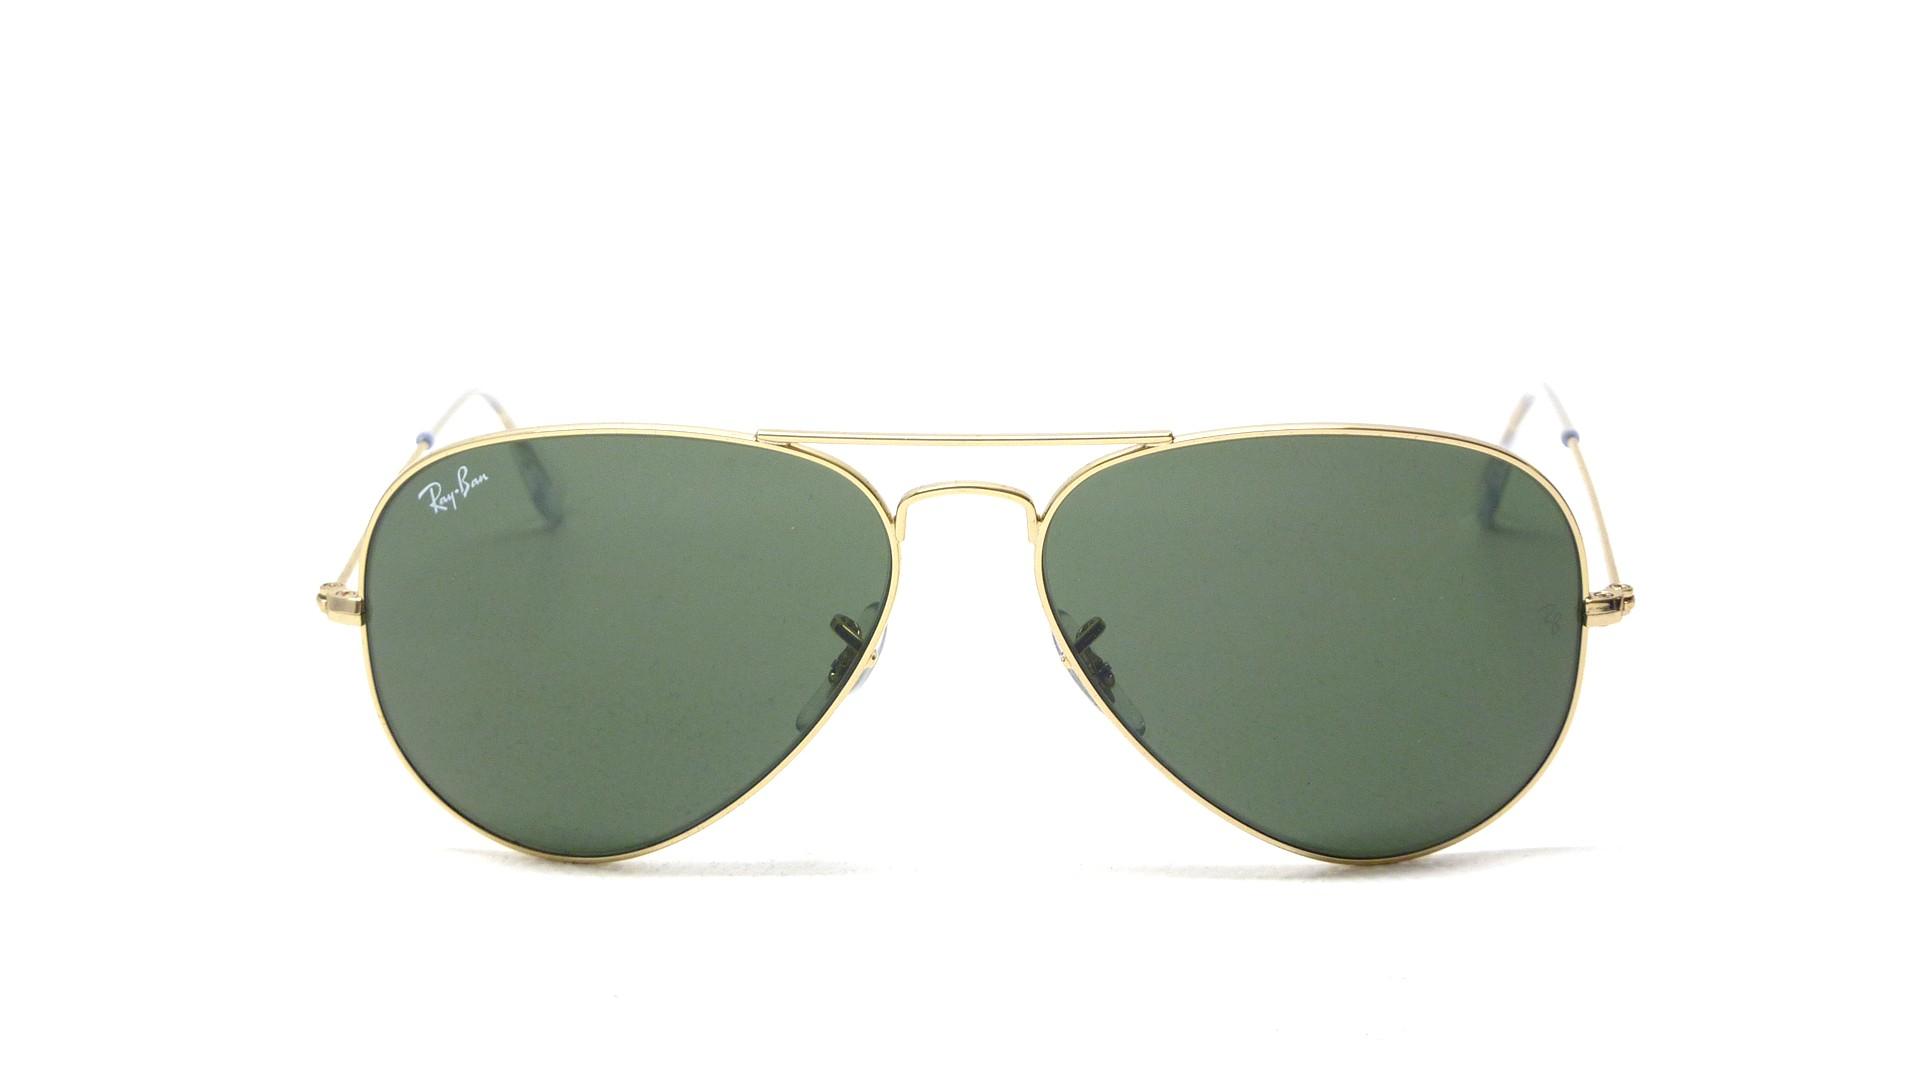 594e9c0c0da55 Sunglasses Ray-Ban Aviator Large Metal II Gold RB3026 L2846 62-14 Large